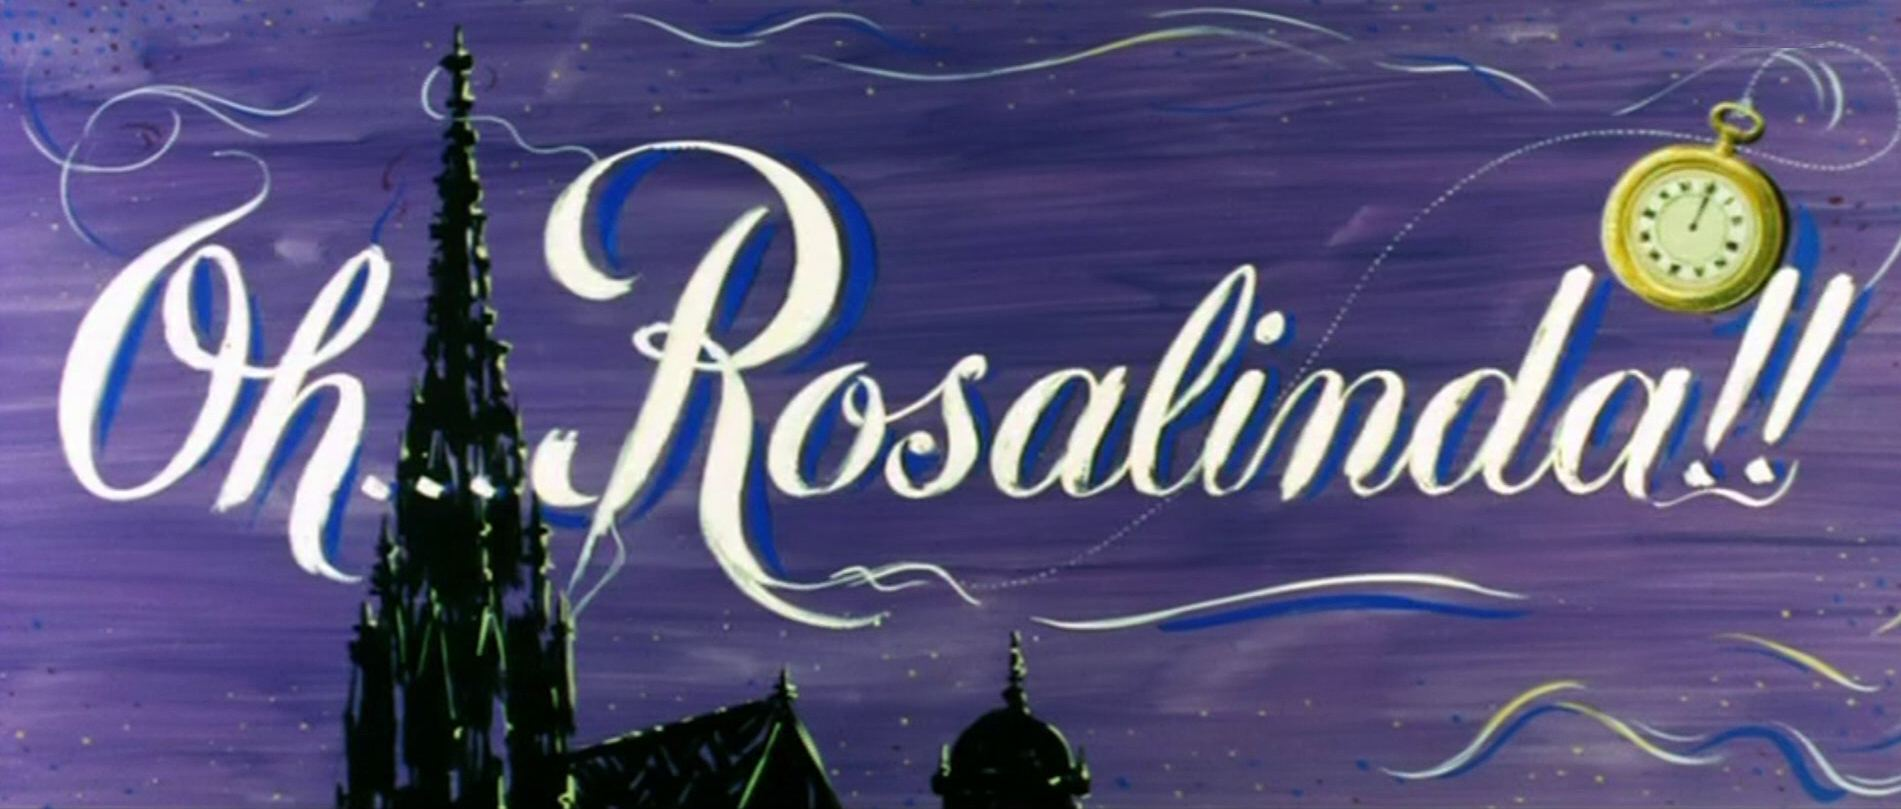 Main title from Oh… Rosalinda!! (1955) (3)